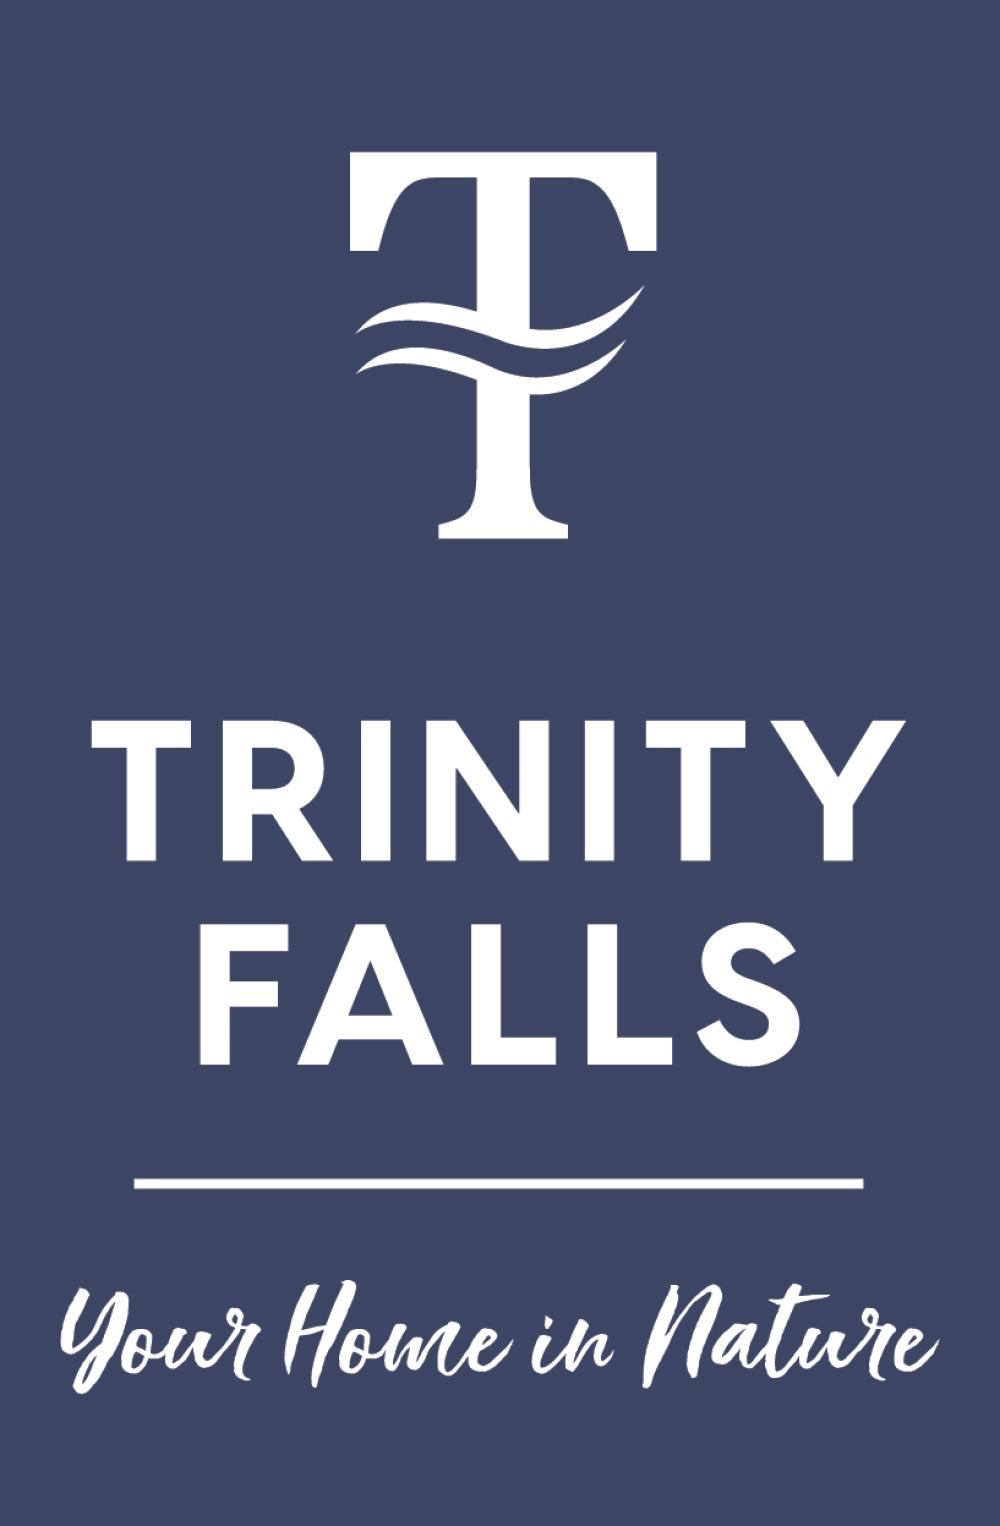 Trinity Falls Logo